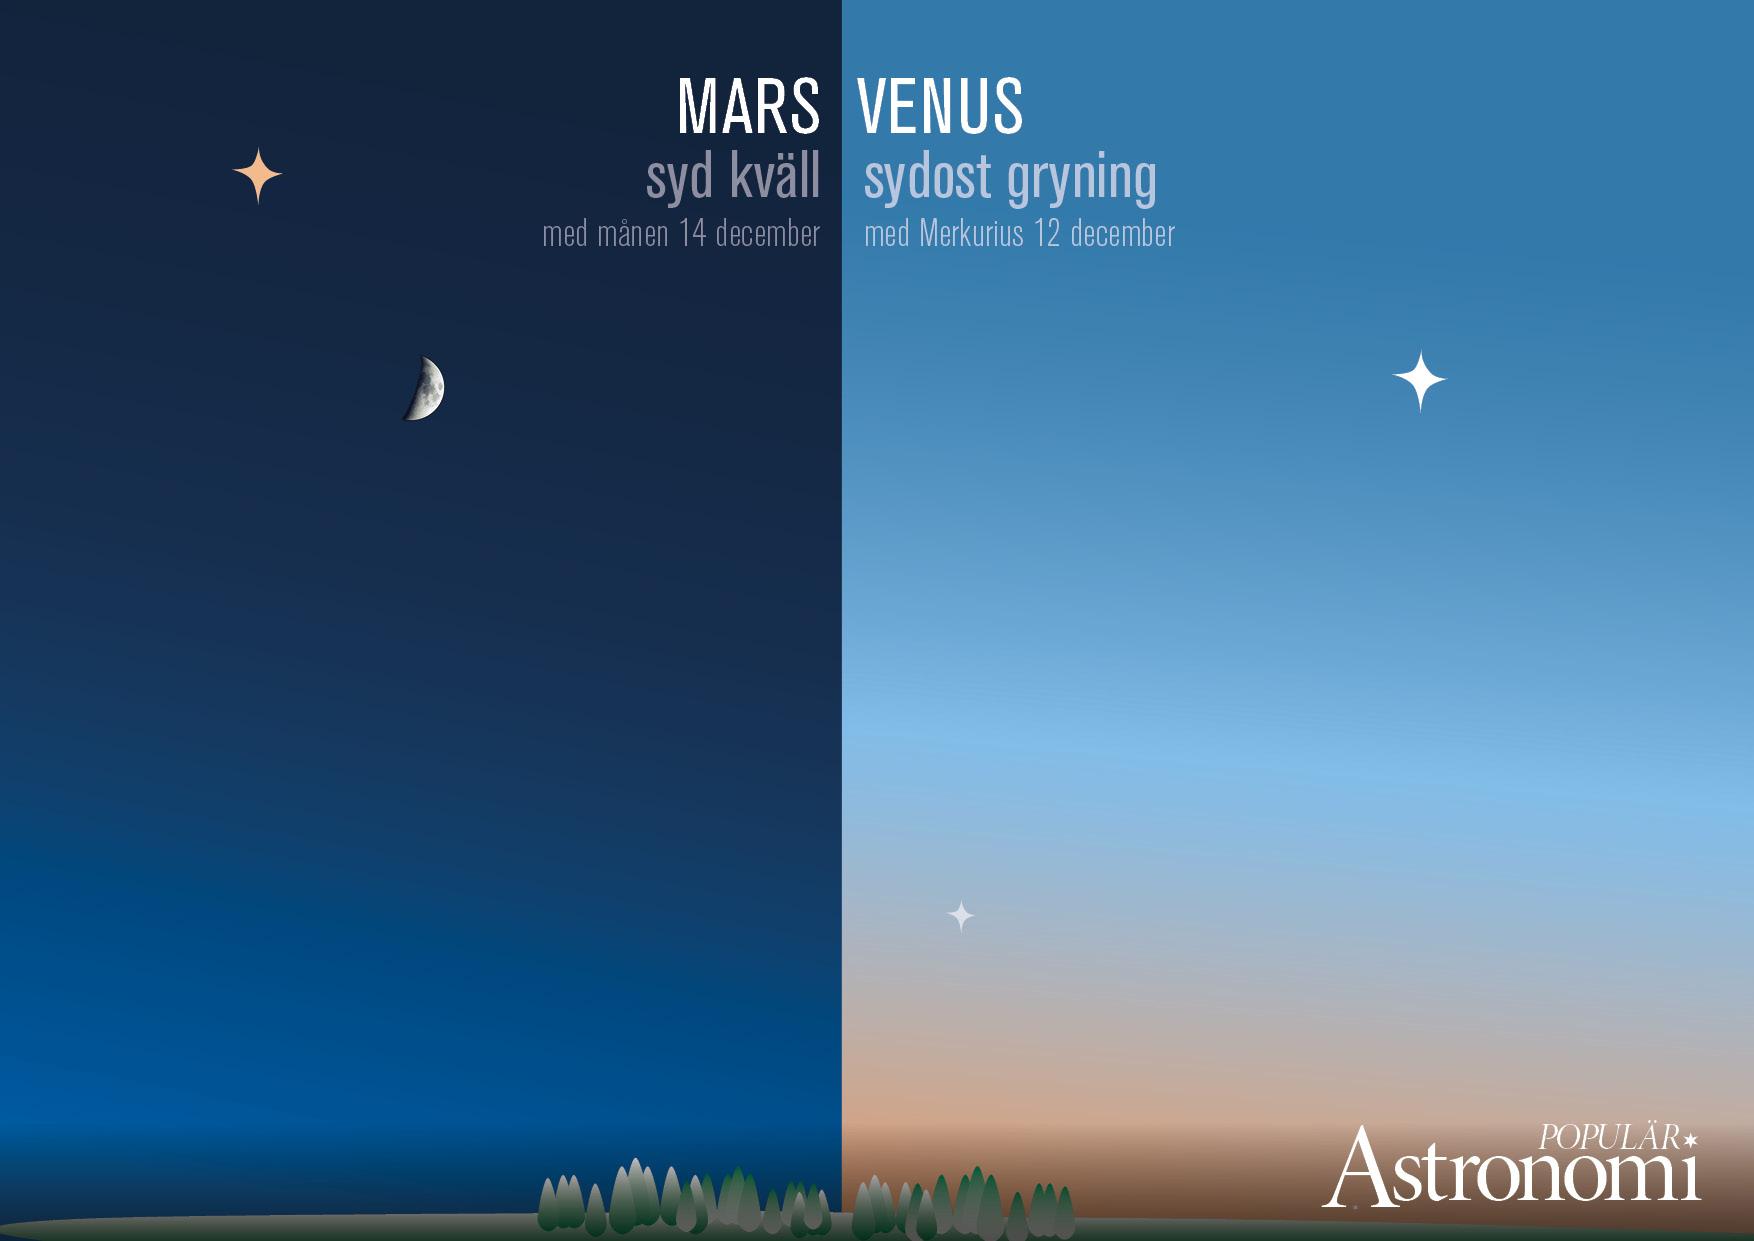 Grafik: Populär Astronomi